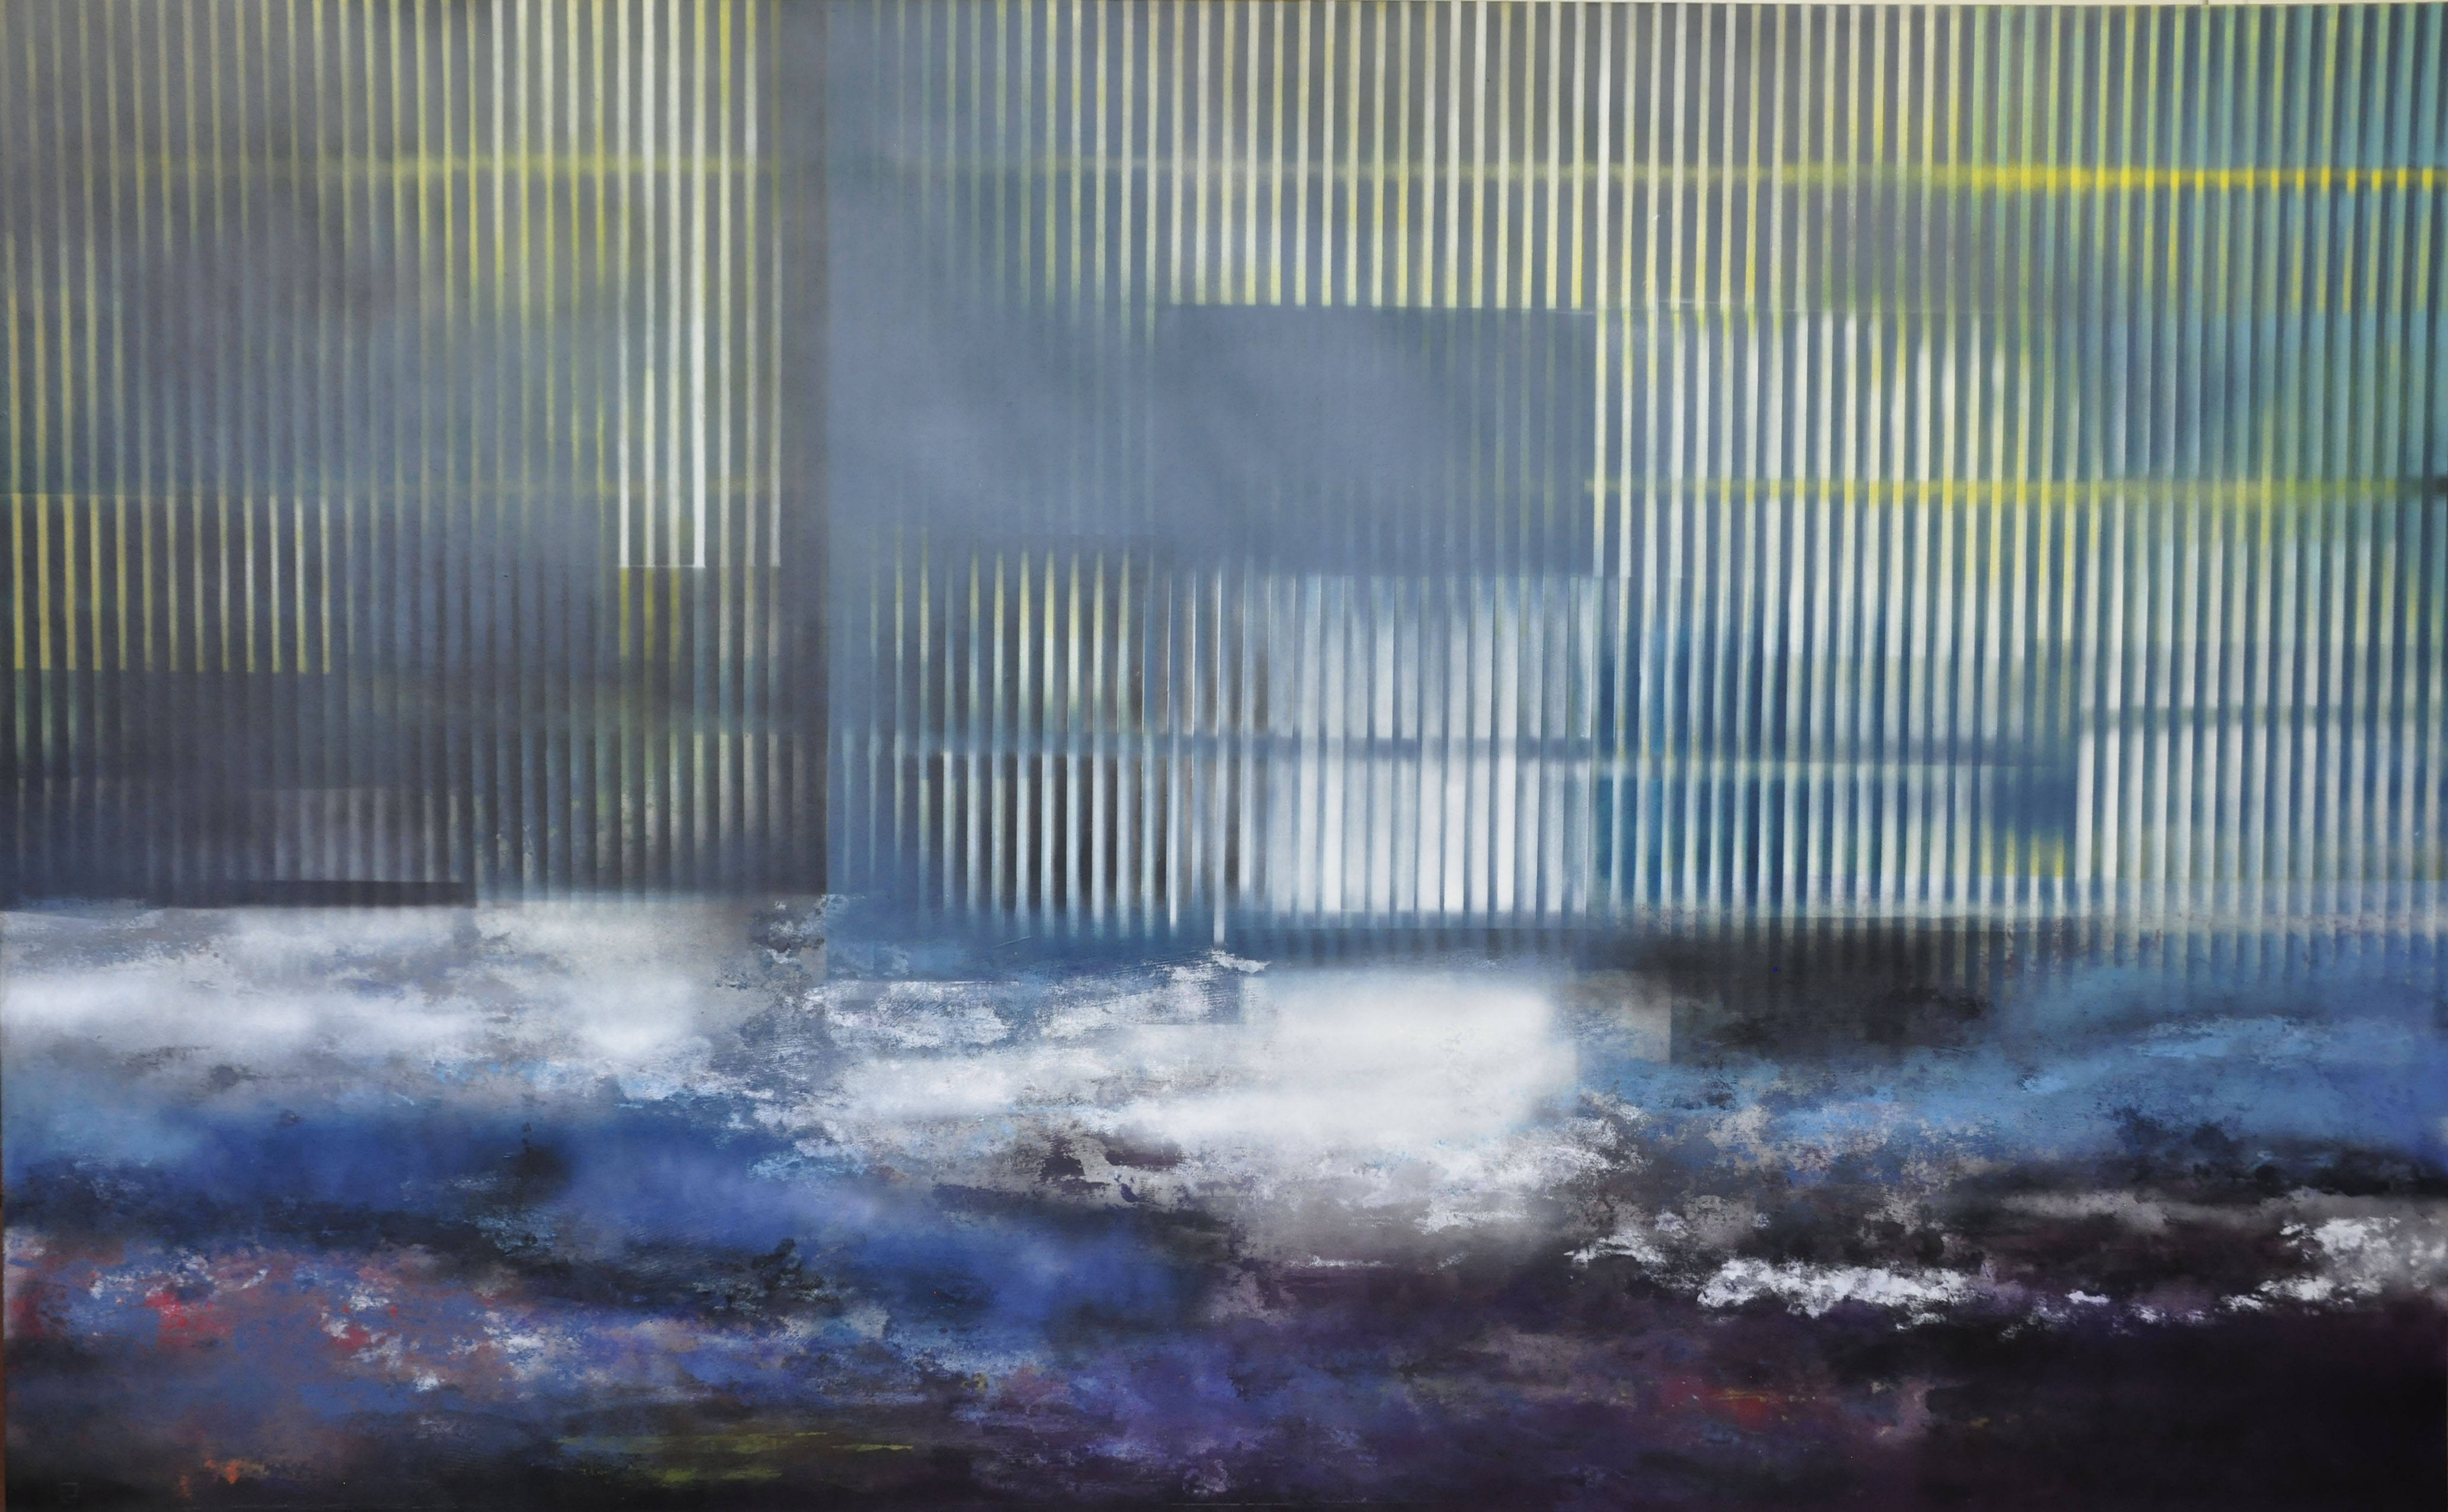 Acrylique sur isorel 16, 122x200, EricHu